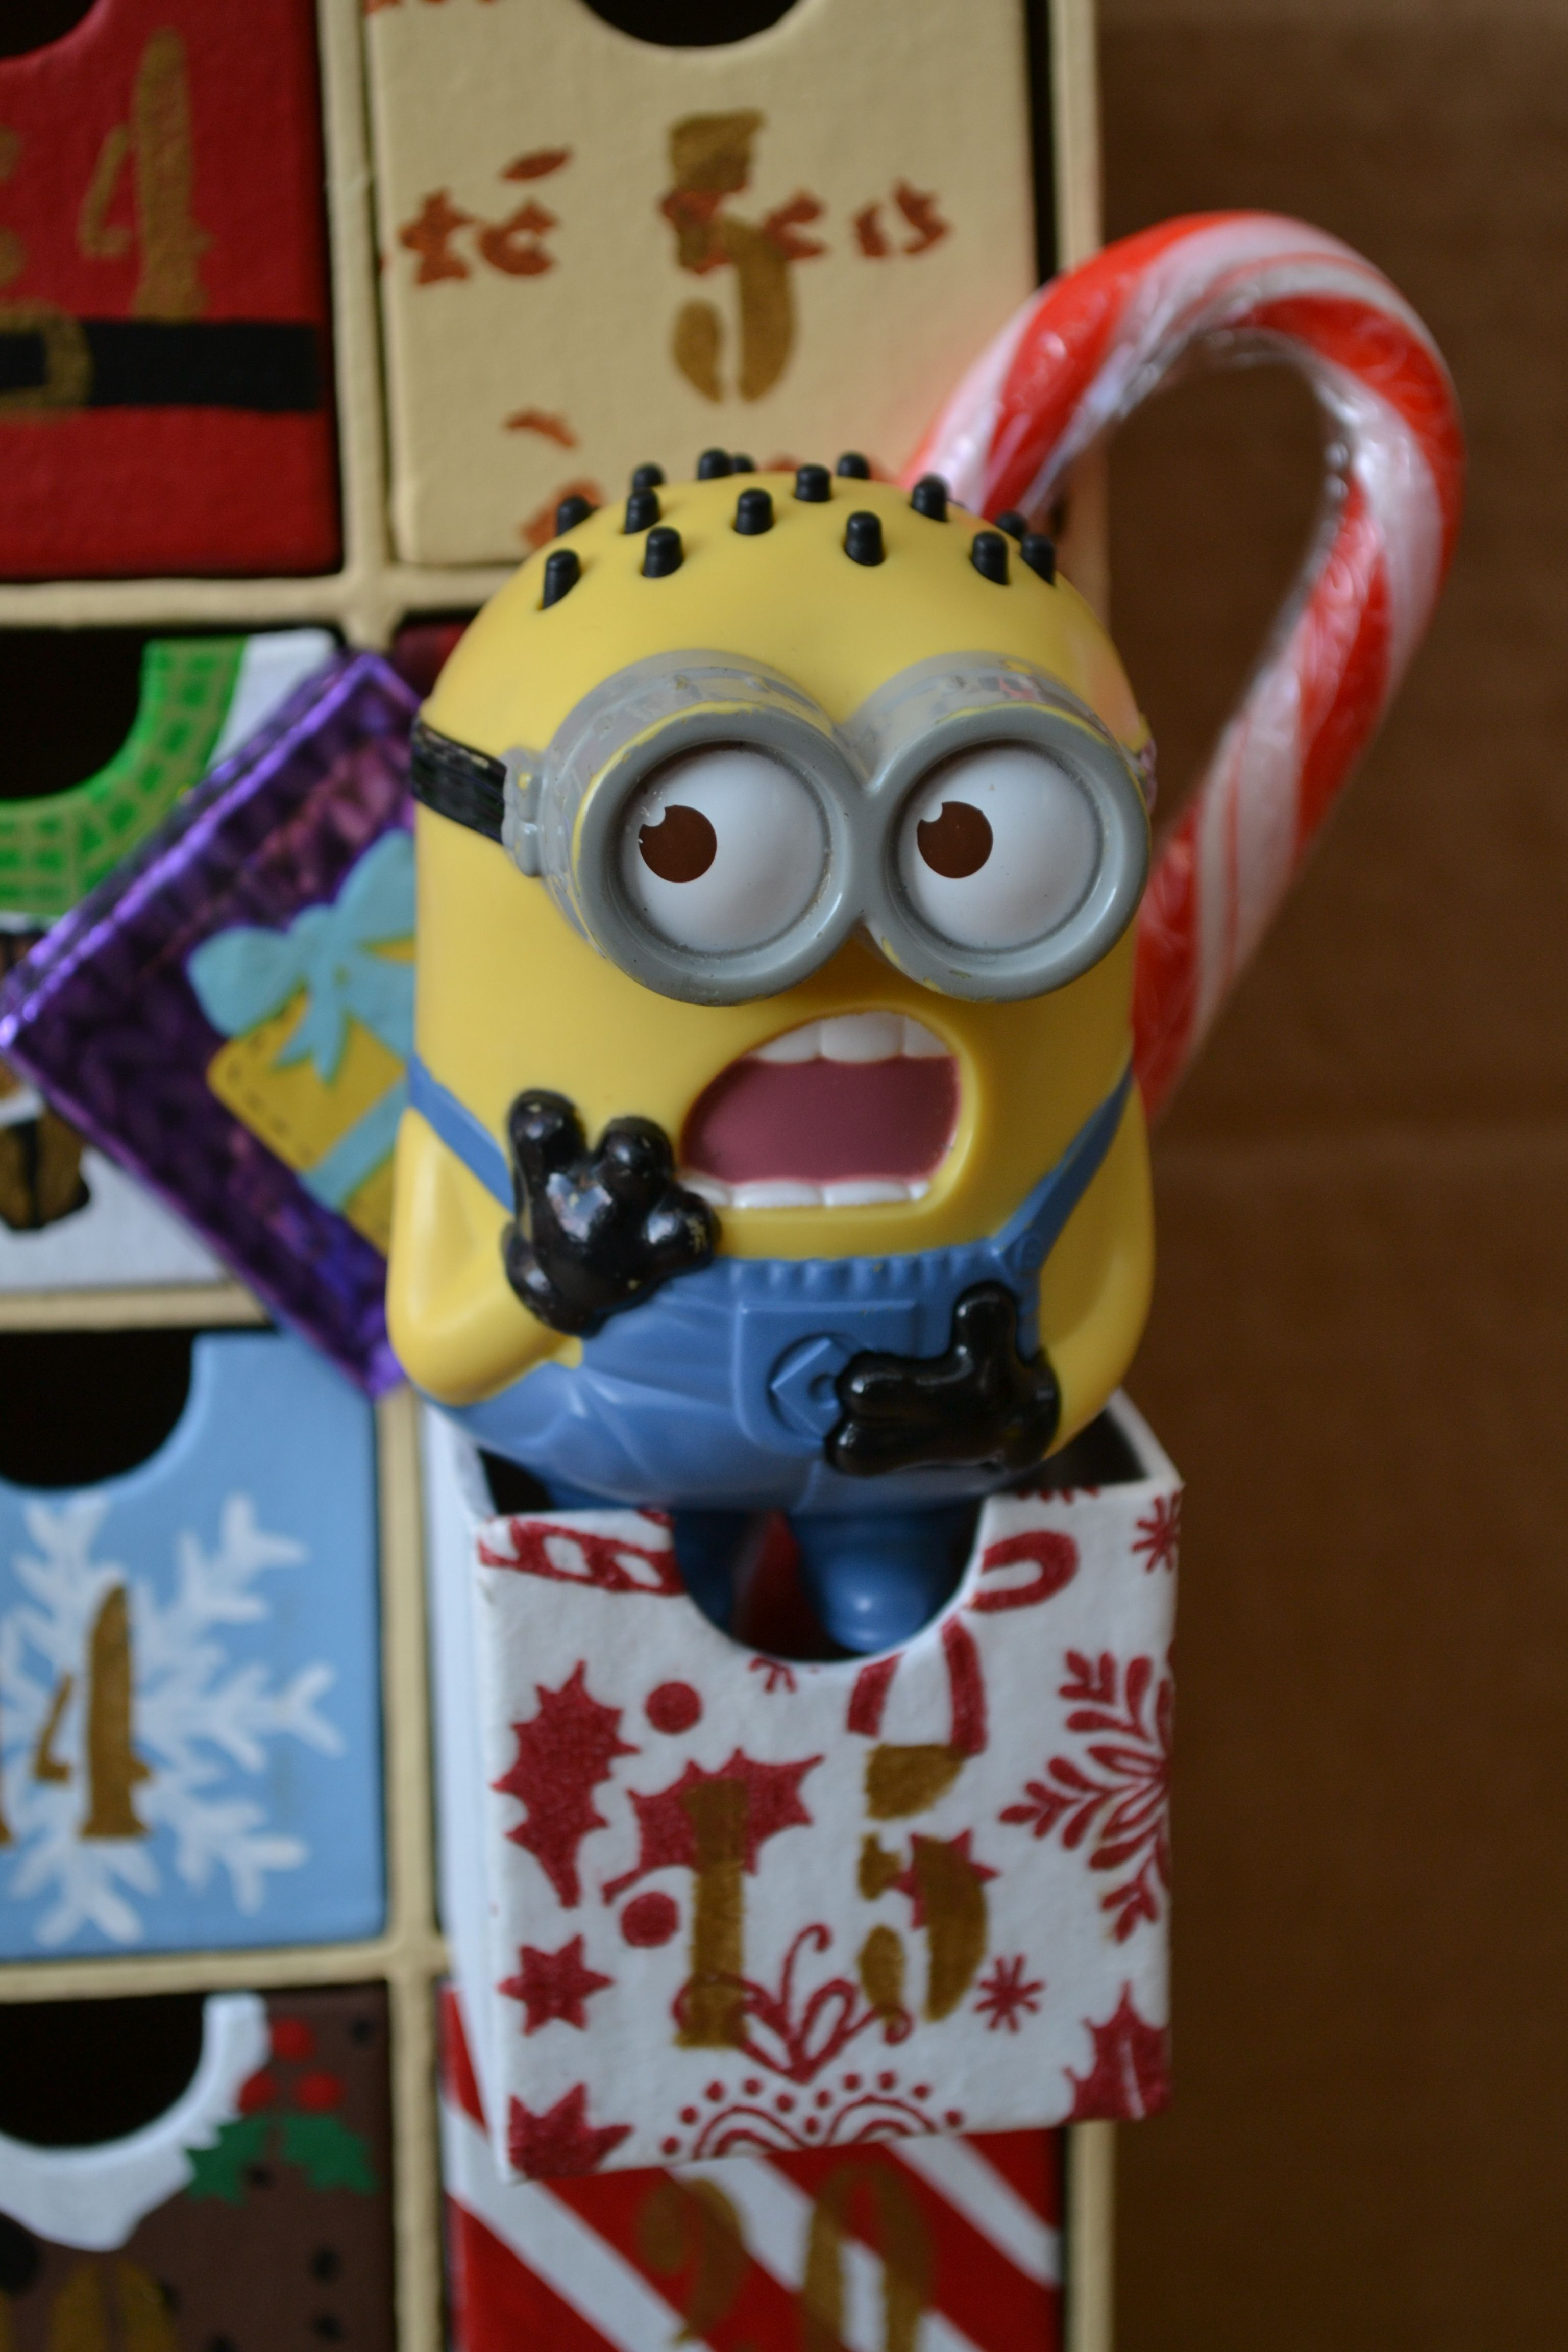 10 Daves til Christmas #Christmascountdown